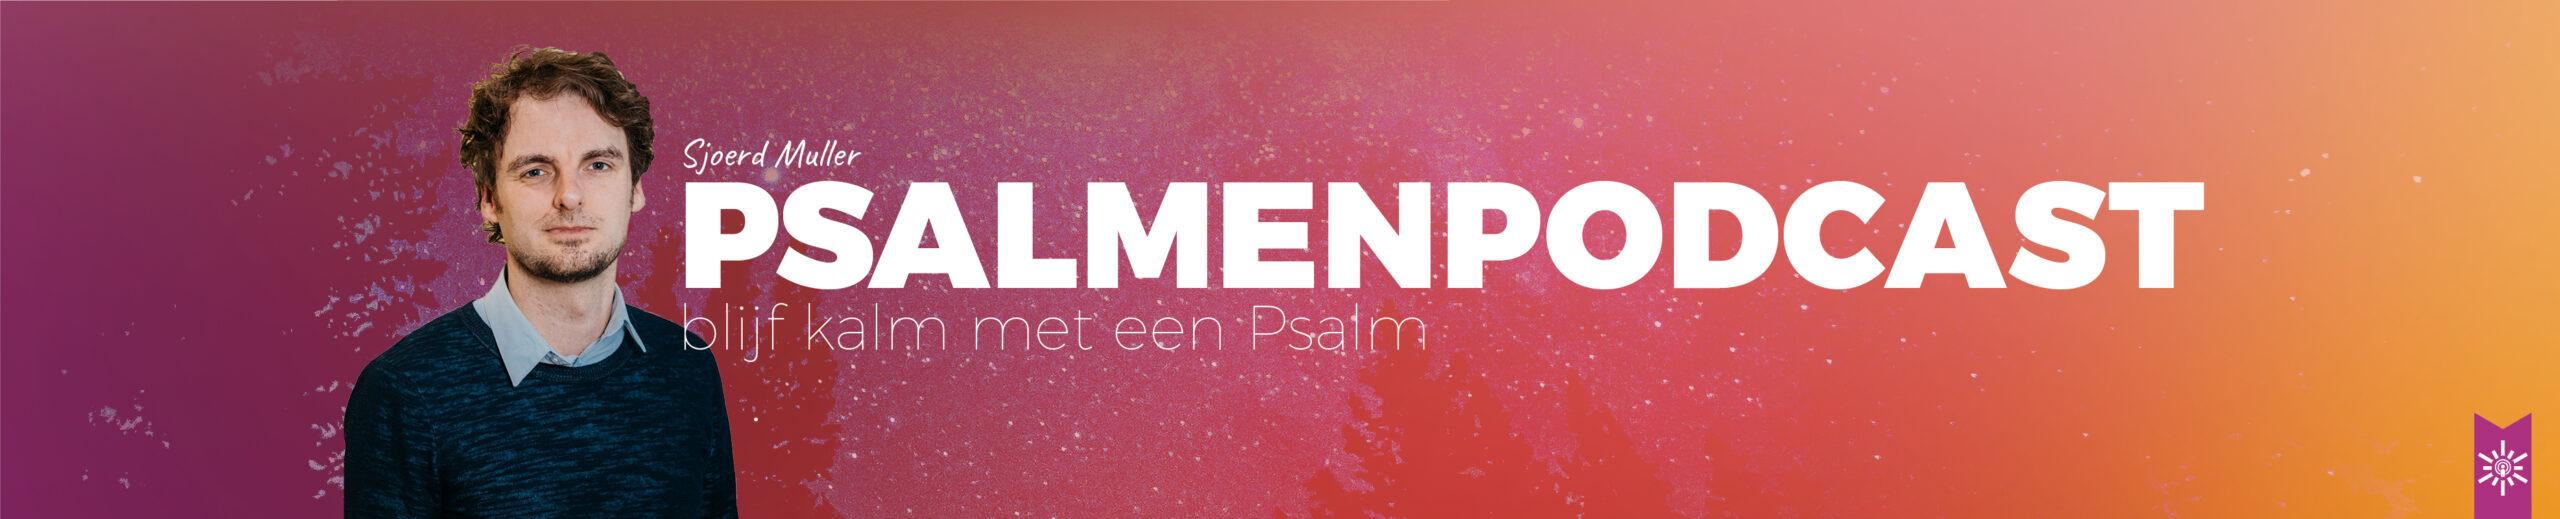 Psalmenpodcast